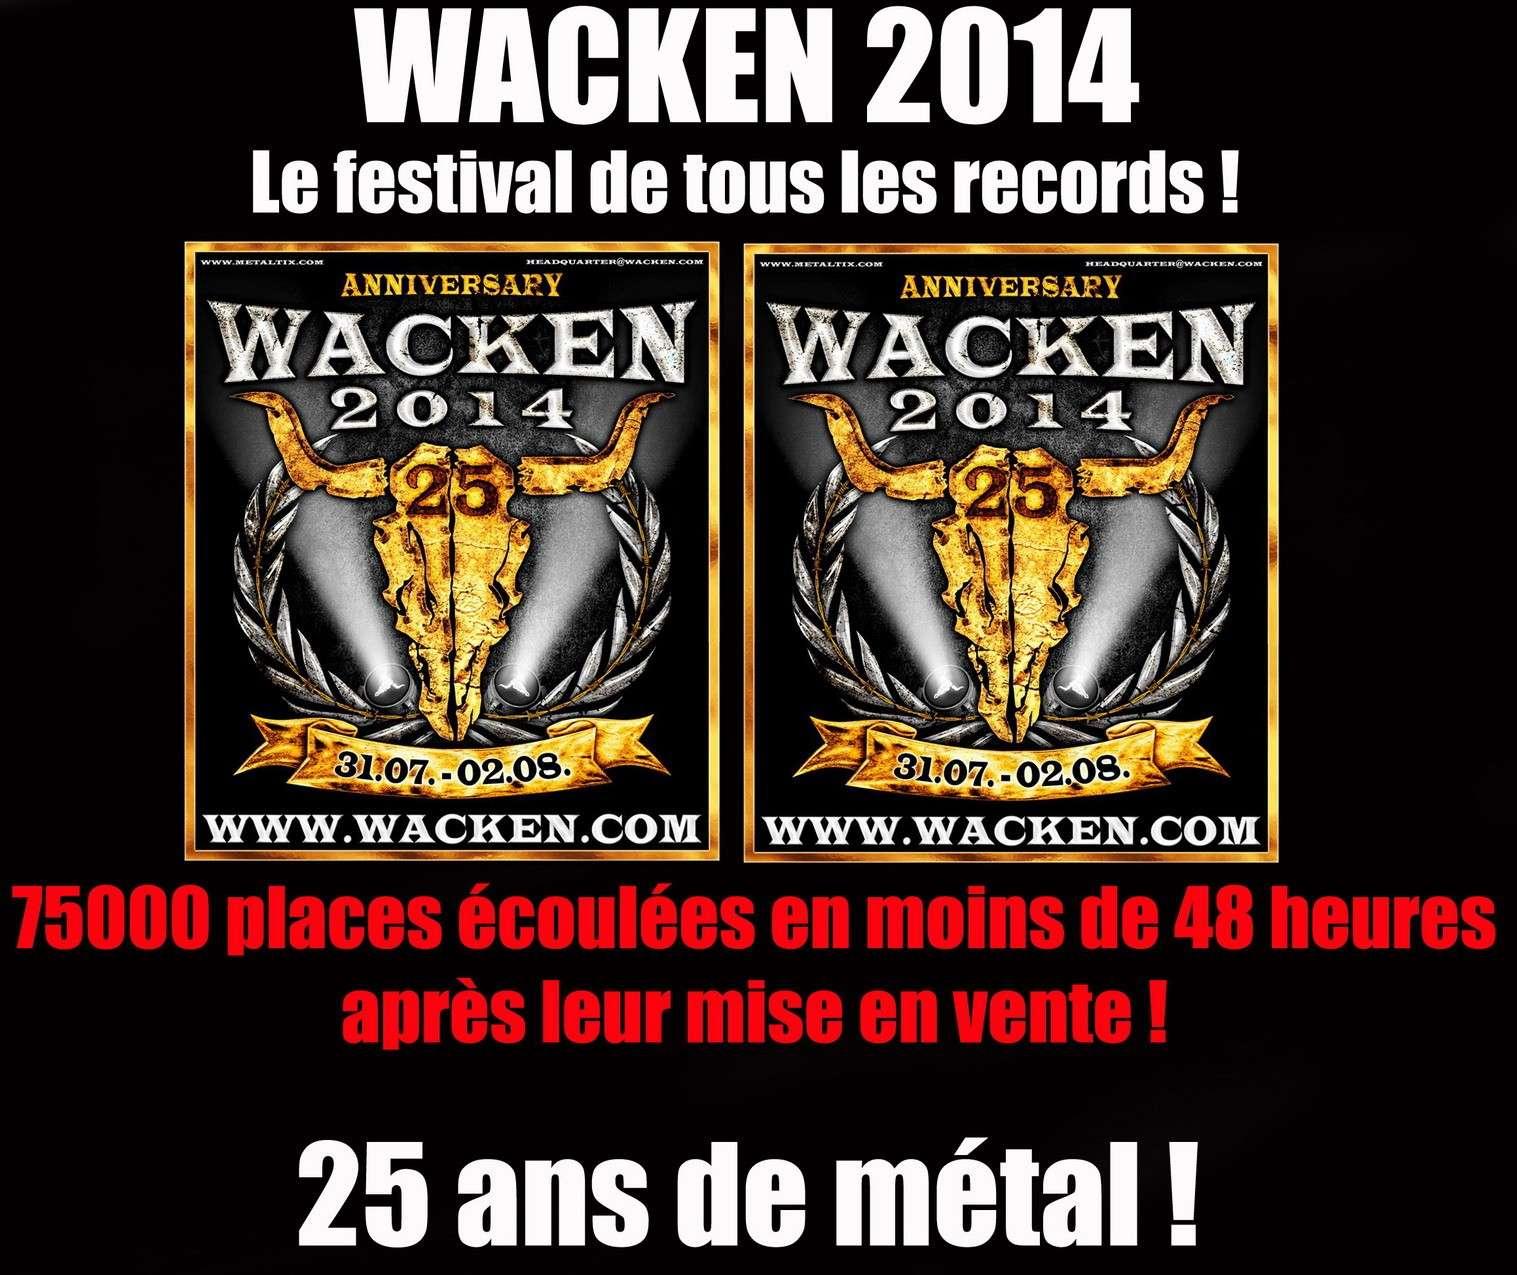 Les NEWS du METAL en VRAC ... - Page 5 Wacken11